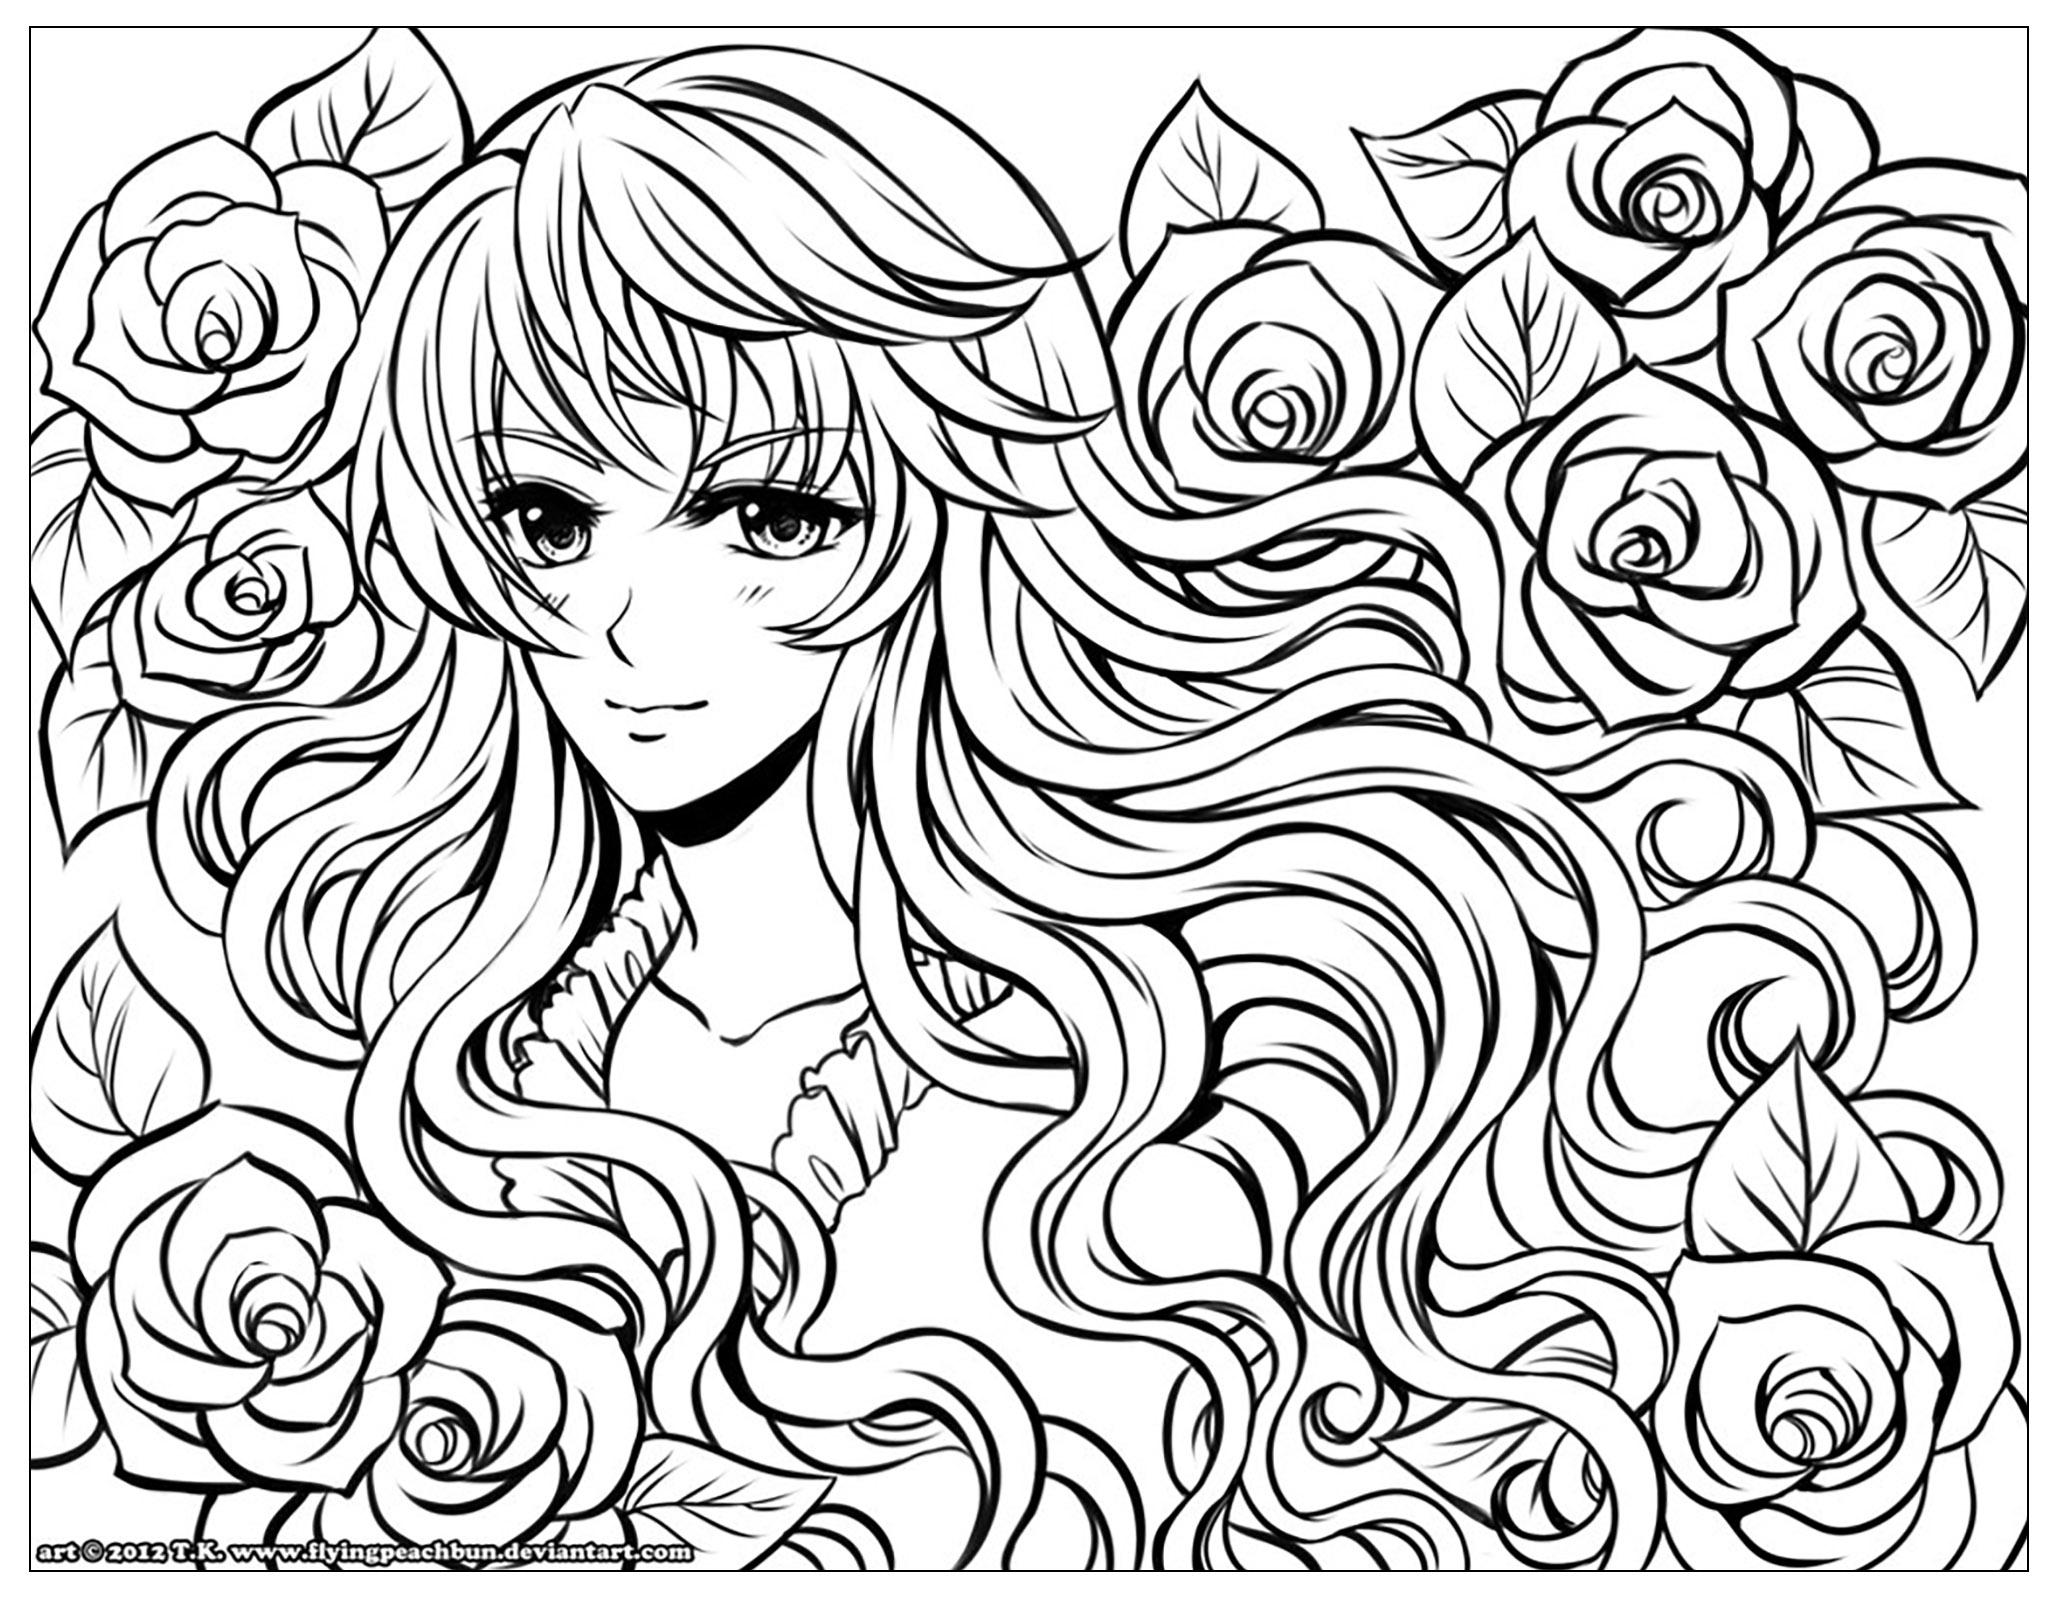 Fille Manga Fleurs Dans Ses Cheveux